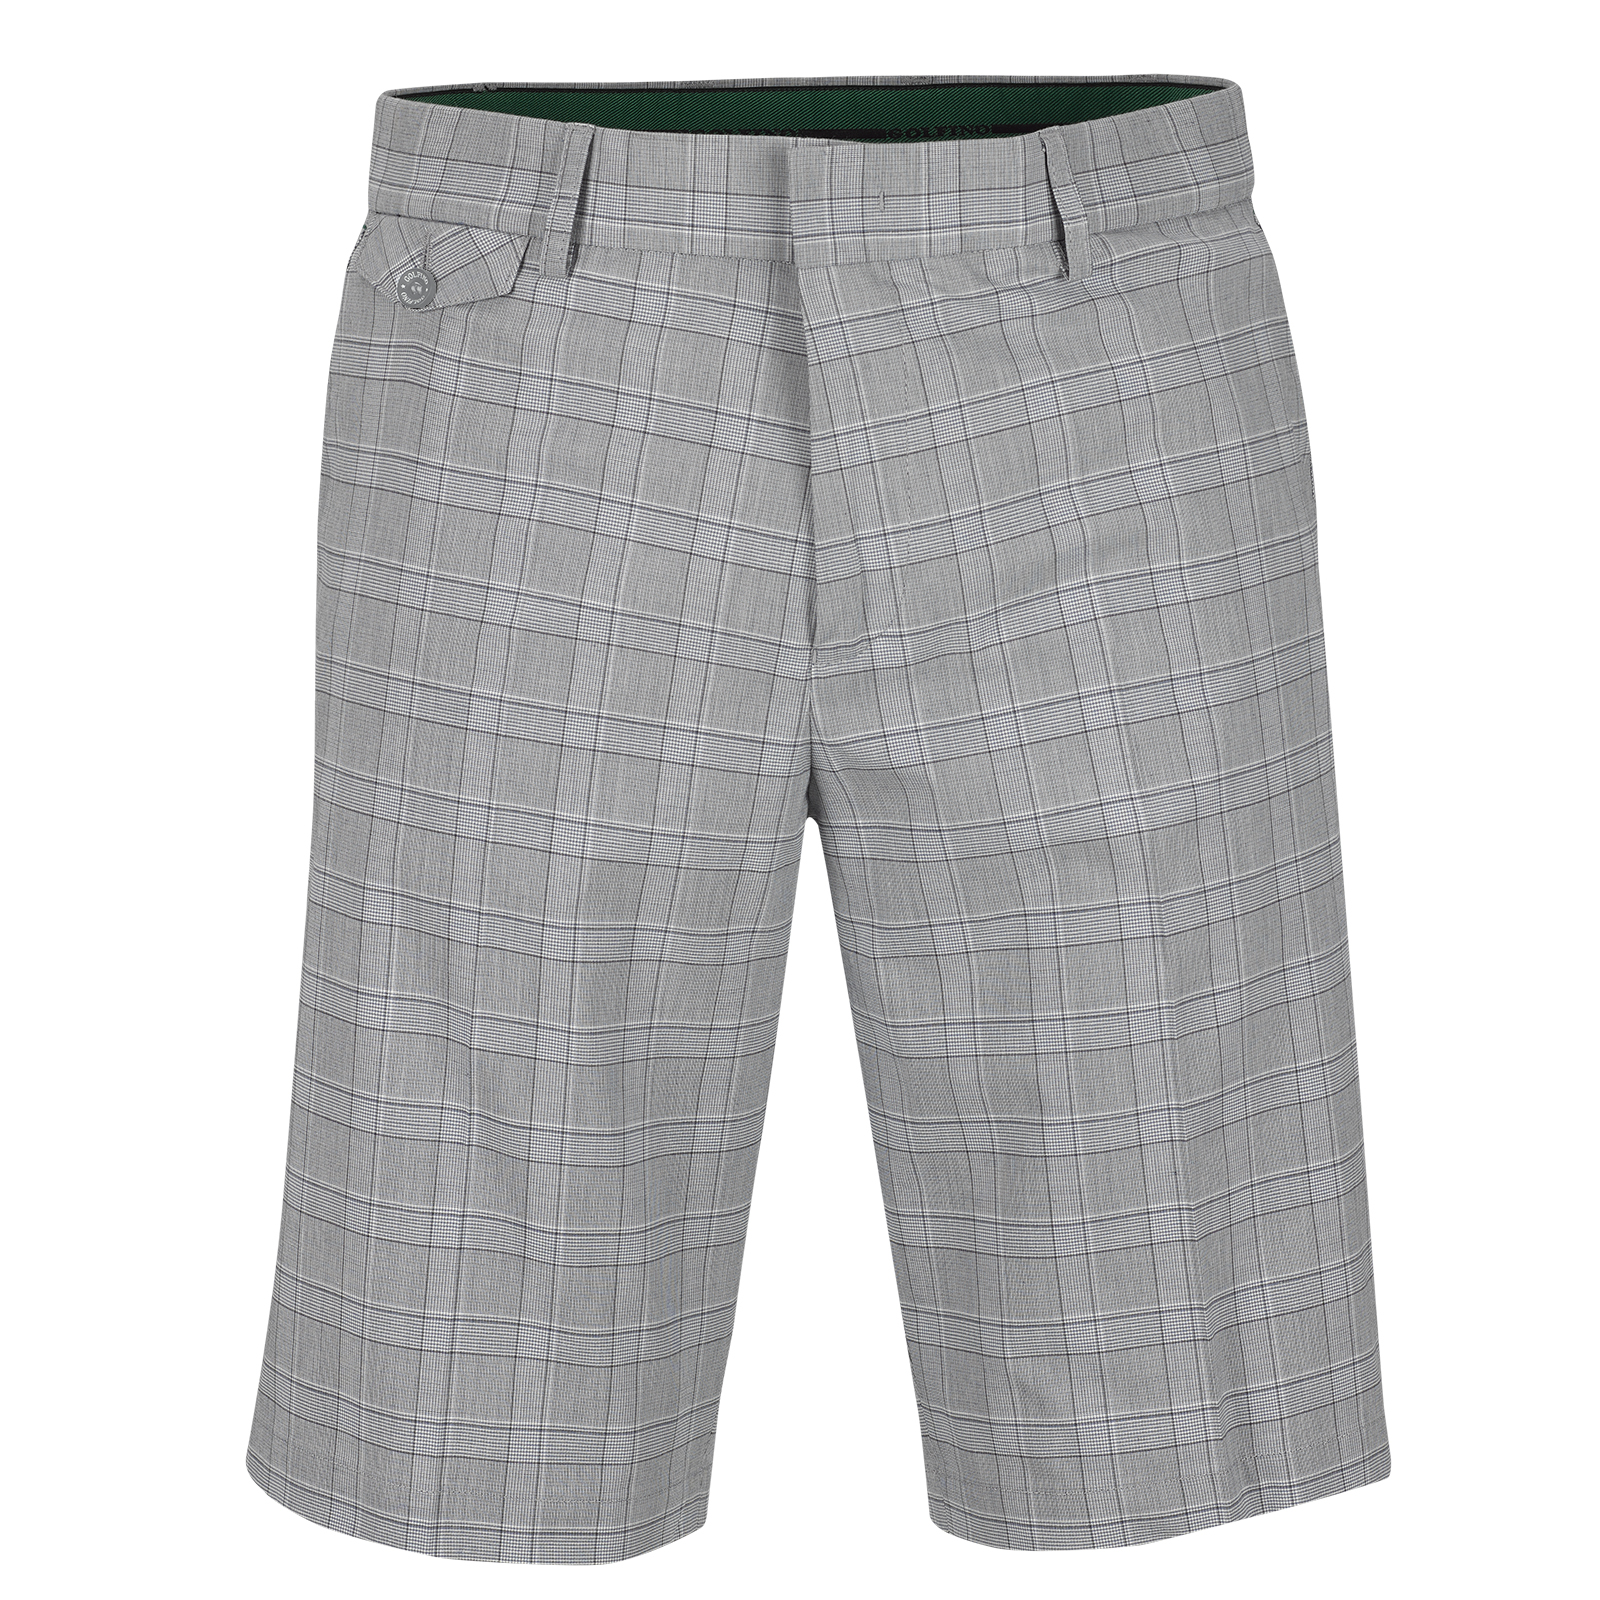 Men's Cotton Karo Golf Bermuda with Stretch function